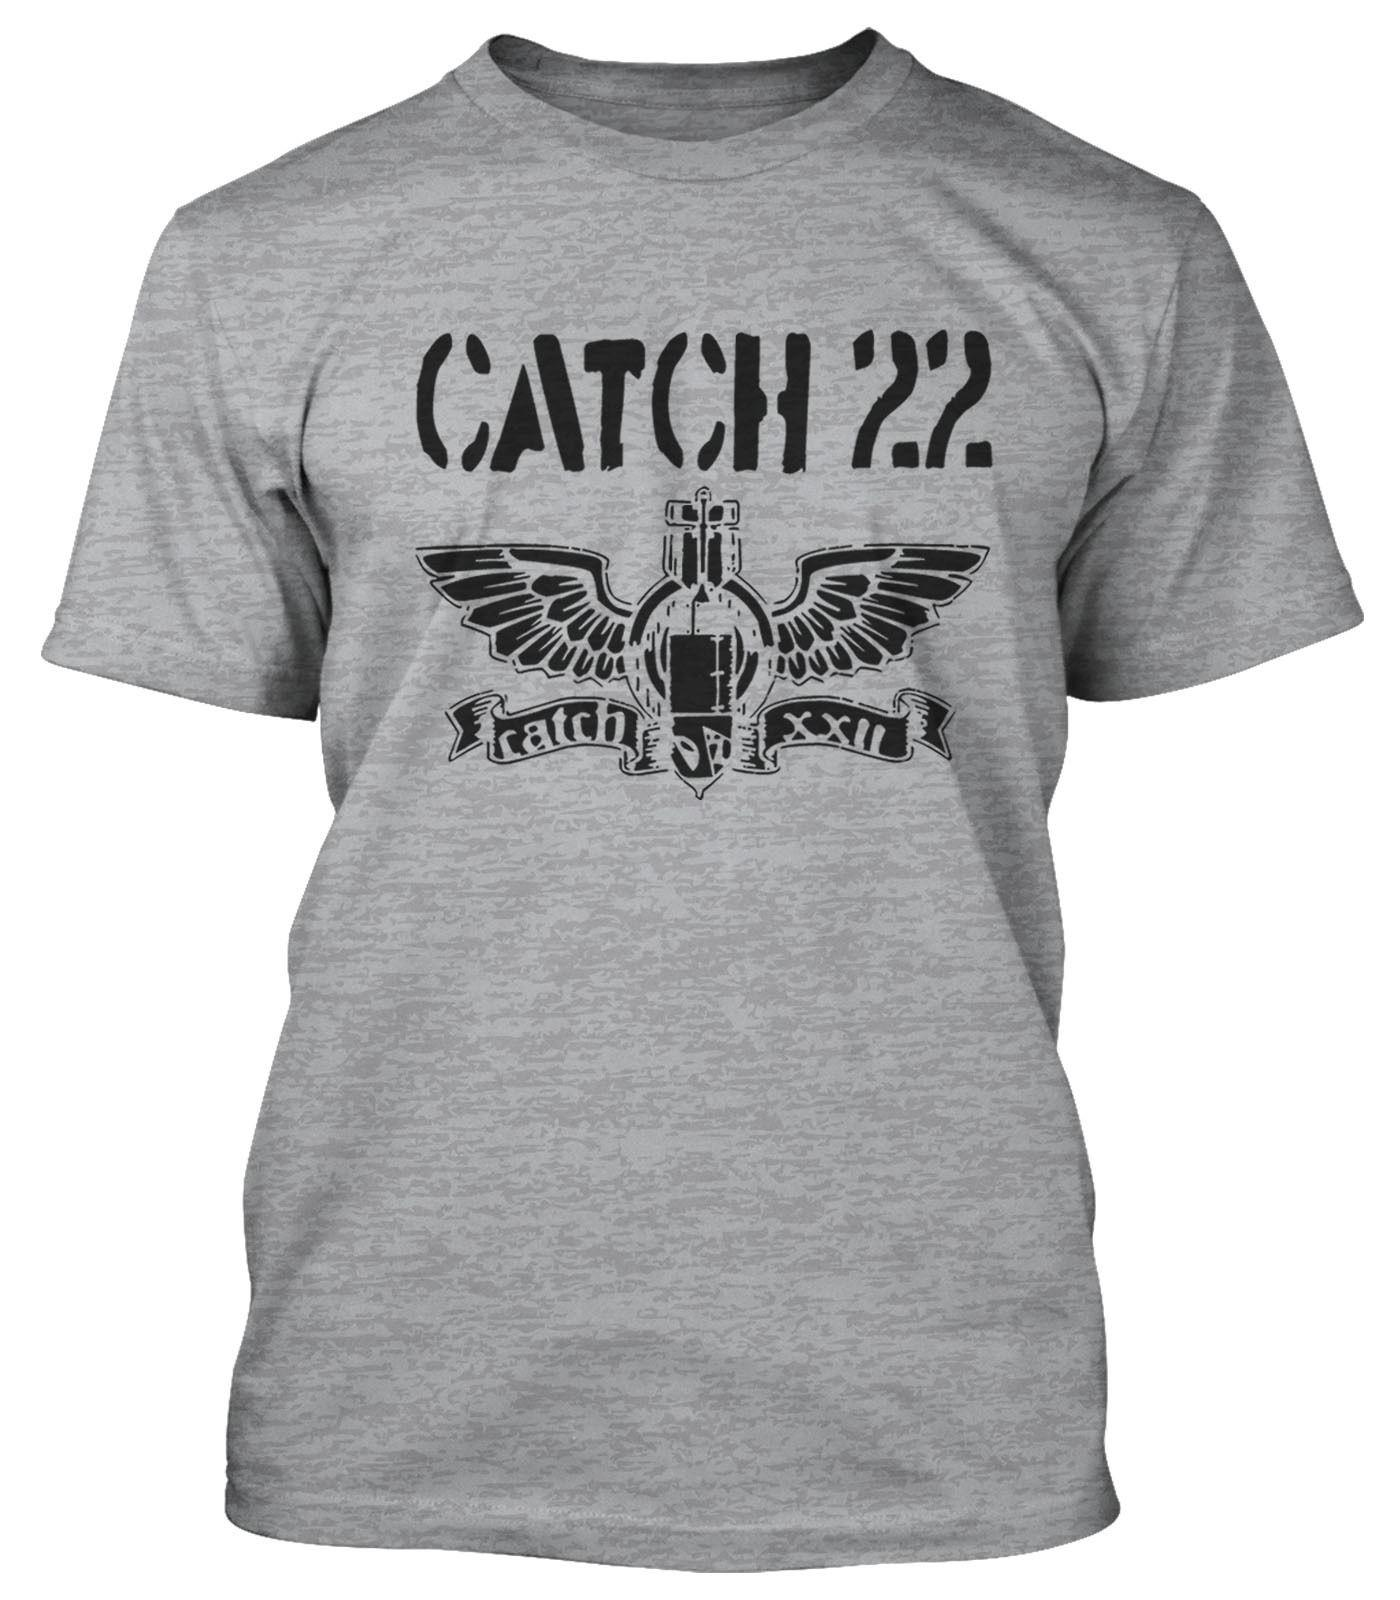 Compre CATCH 22 CAMISETA SKA PUNK CATCH 22 2018 Nuevas Camisetas Divertidas  Hipster O Cuello Cool Tops Hip Hop Manga Corta A  11.01 Del Burberrytshirts  ... 3d4b5651340